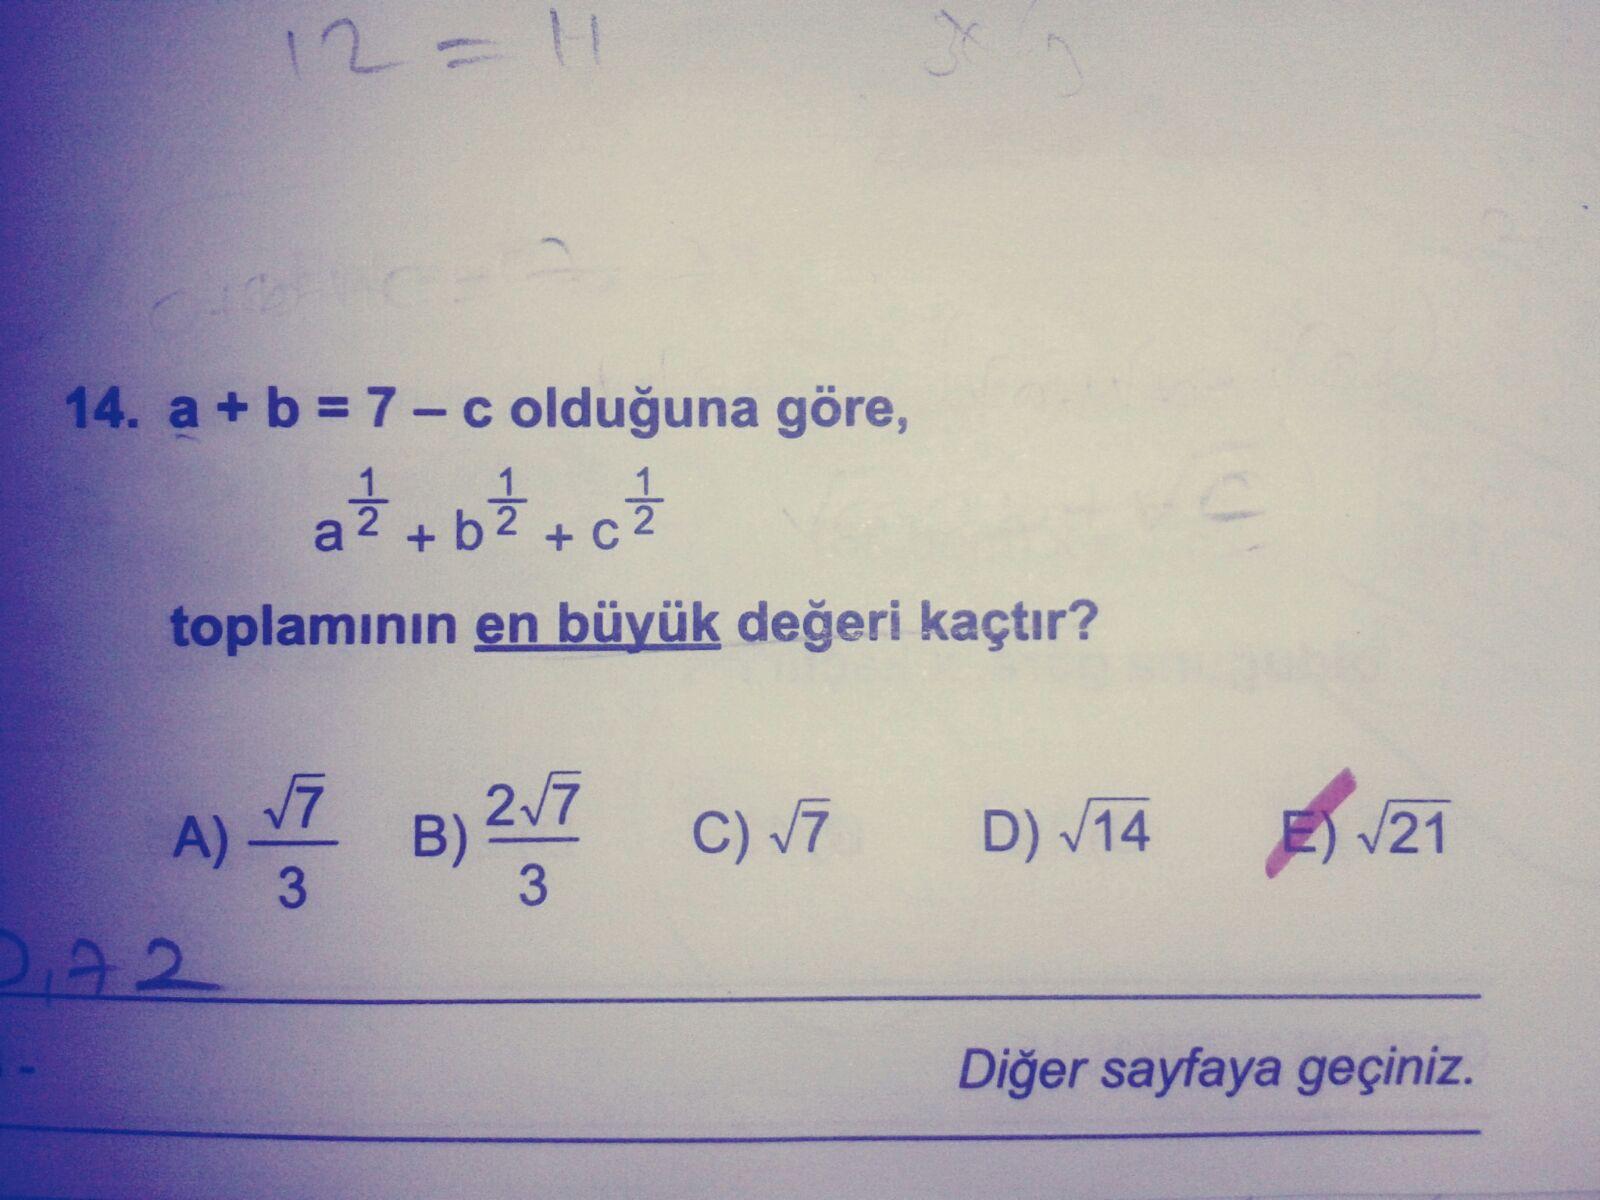 a+b+c=7